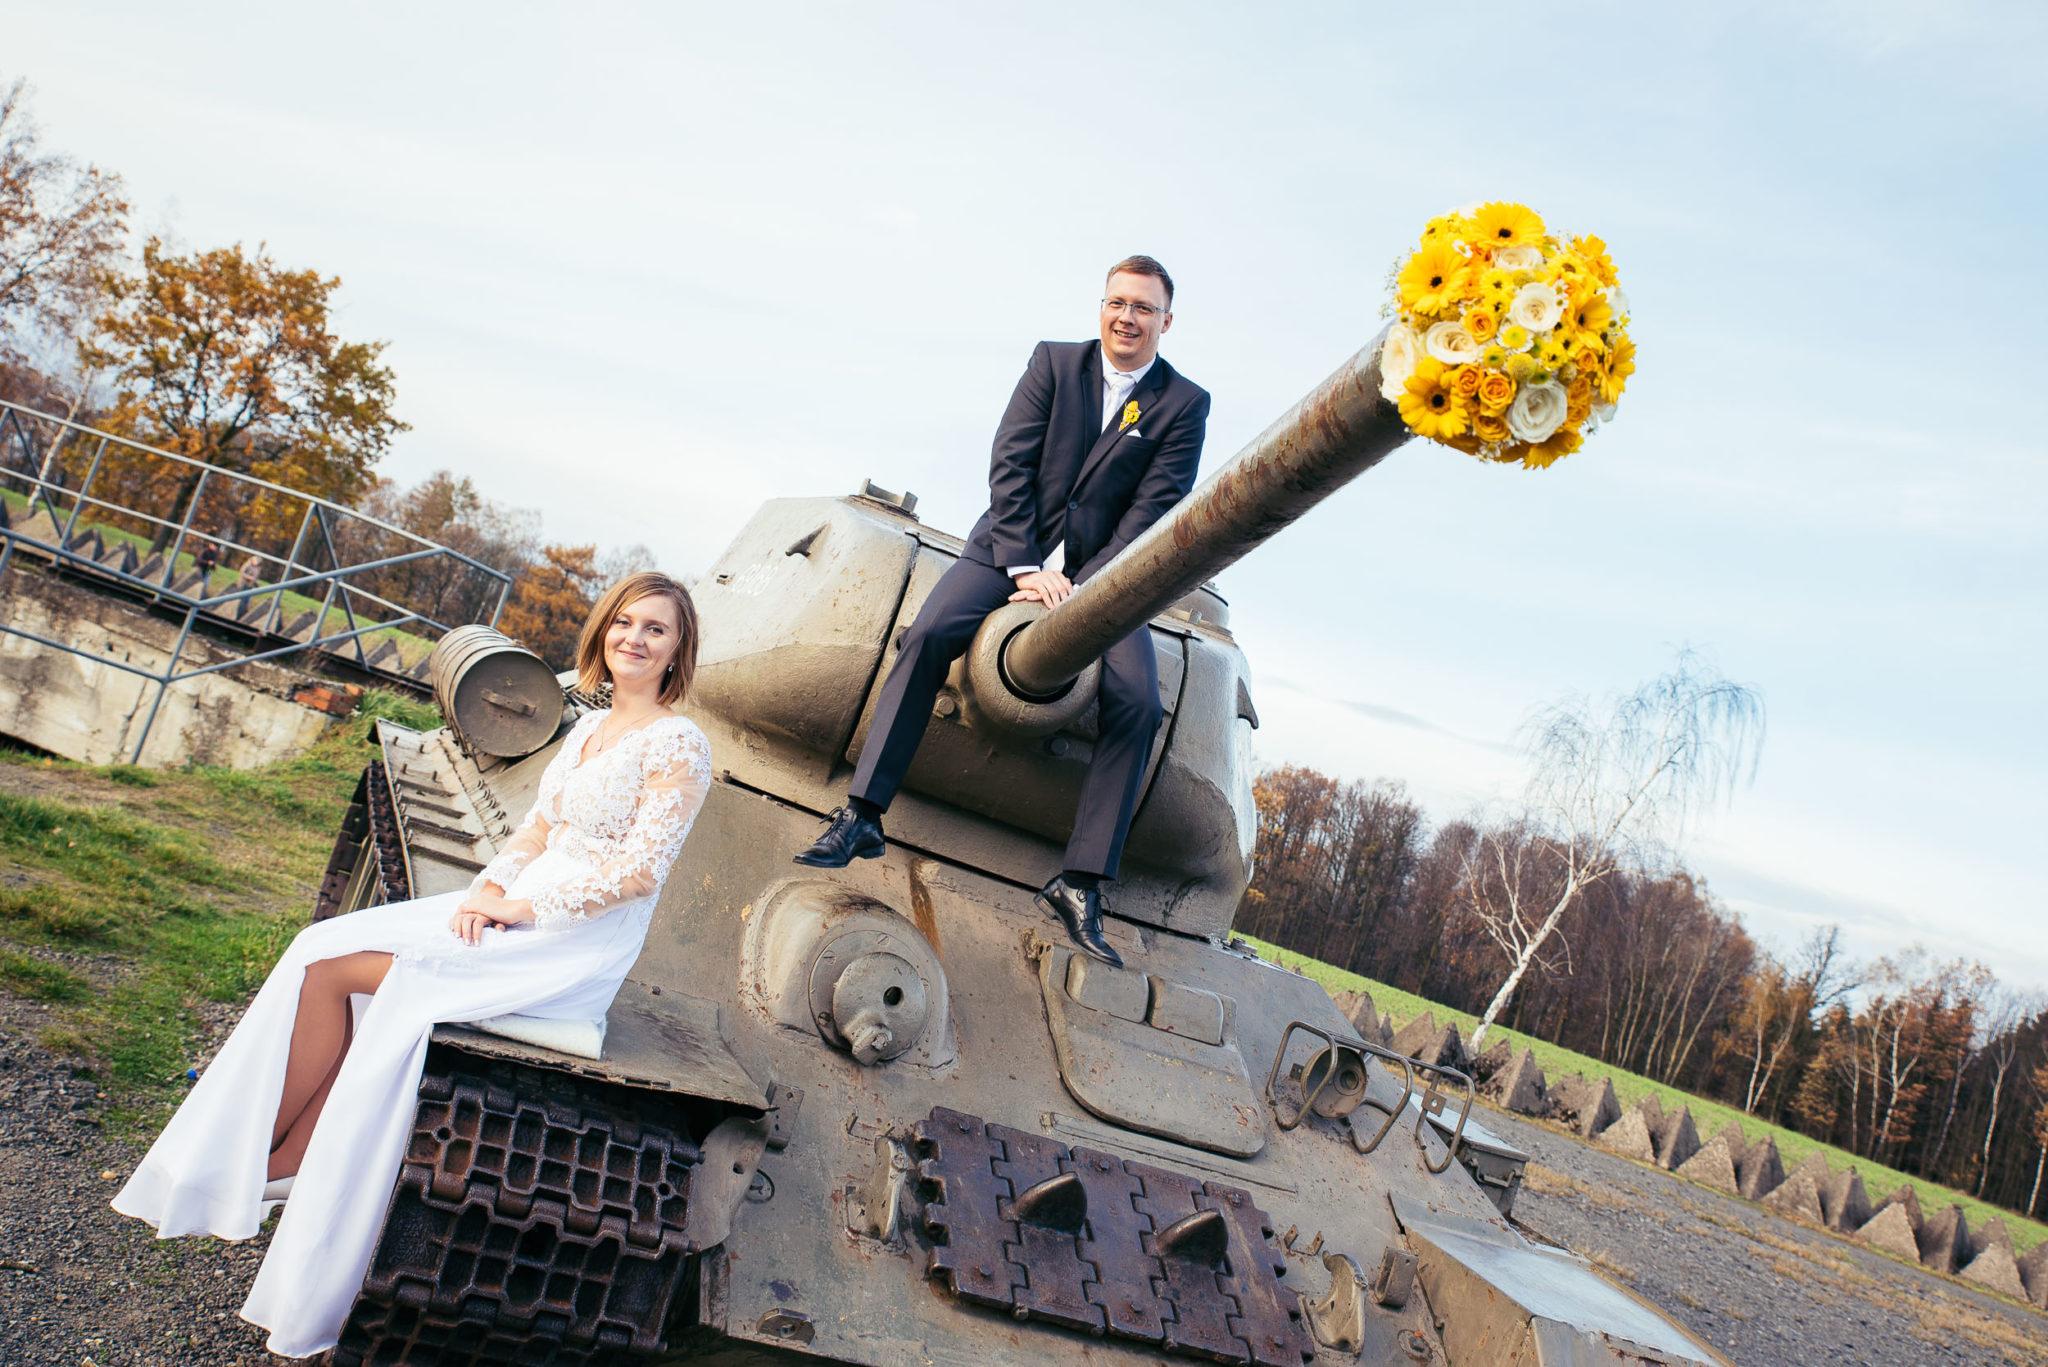 Svatební fotograf, Darkovičky, Hlučín